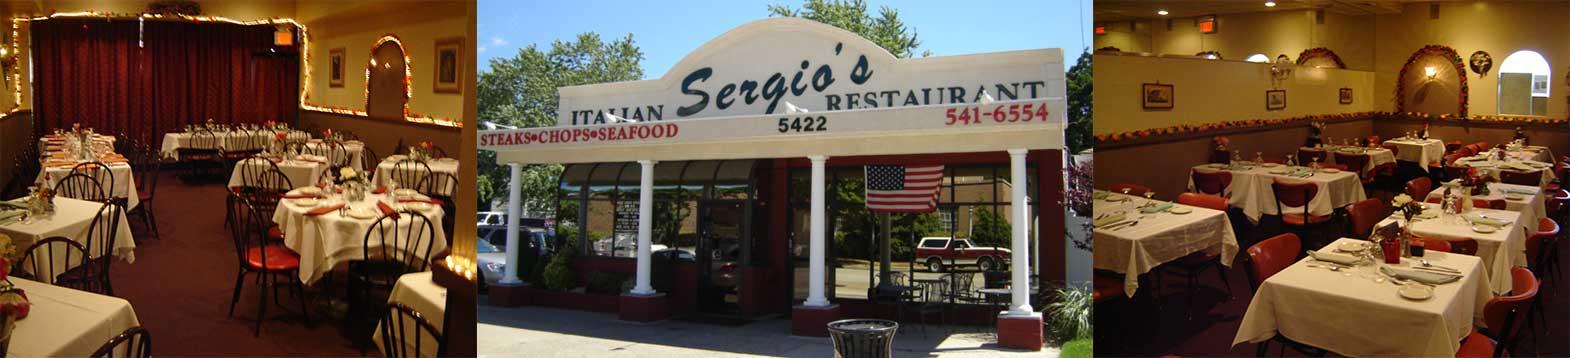 Sergios 516 541 6554 5422 Merrick Road Mapequa Ny 11758 Sergio S Italian Restaurant Has Been Rated Among The Top Ten Restaurants On Long Island For